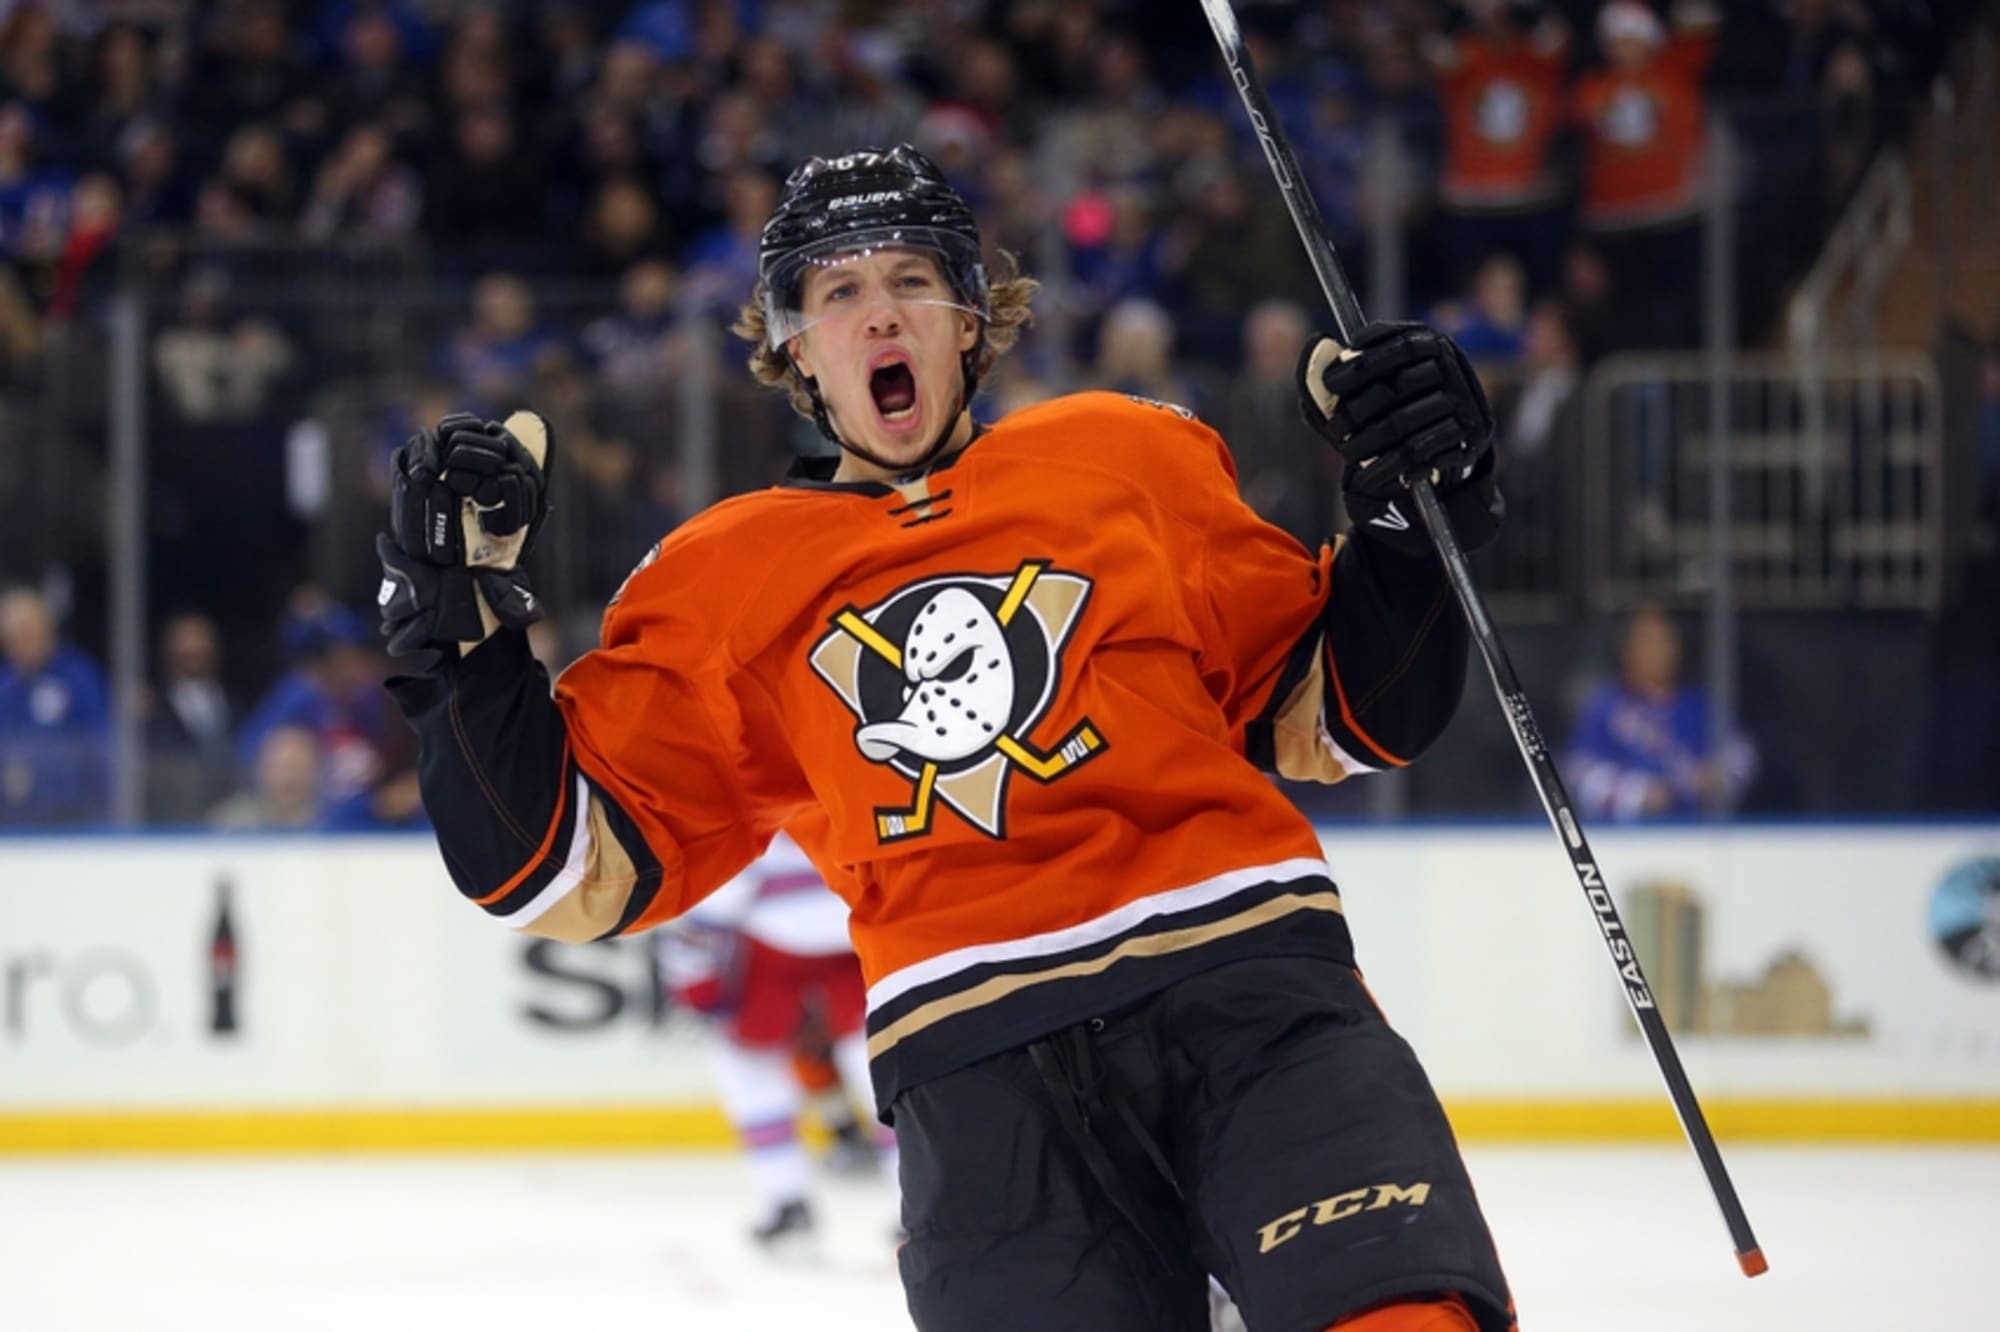 Anaheim Ducks Sign Forward Rickard Rakell to 6-Year Deal